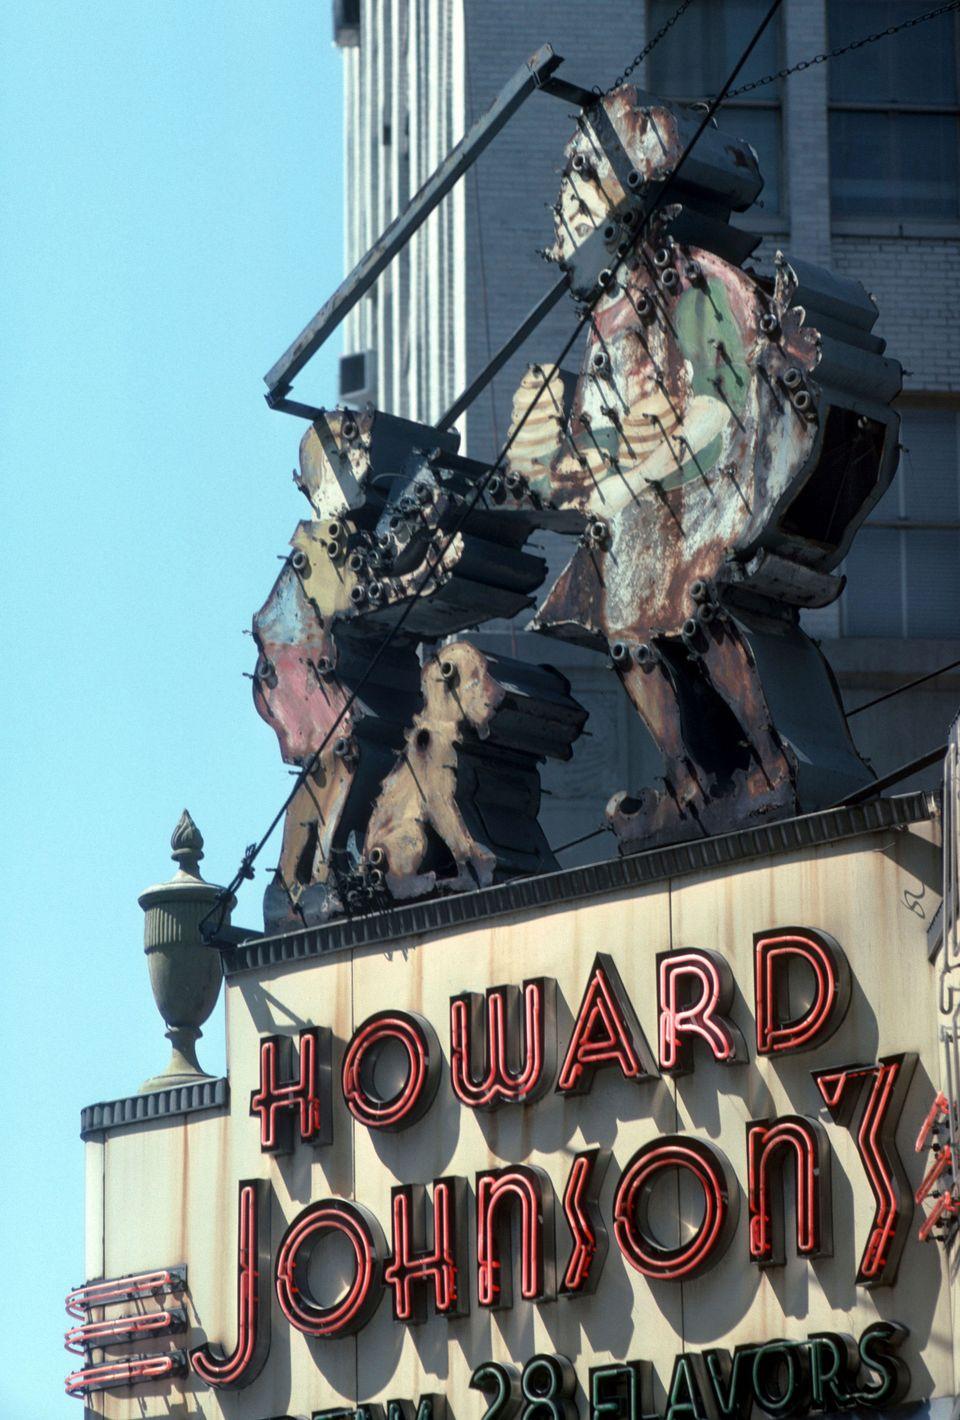 <strong>Restaurants in 2012:</strong> 2 <strong>Restaurants in 1980:</strong> 129 <strong>Year founded:</strong> 1927  Howard